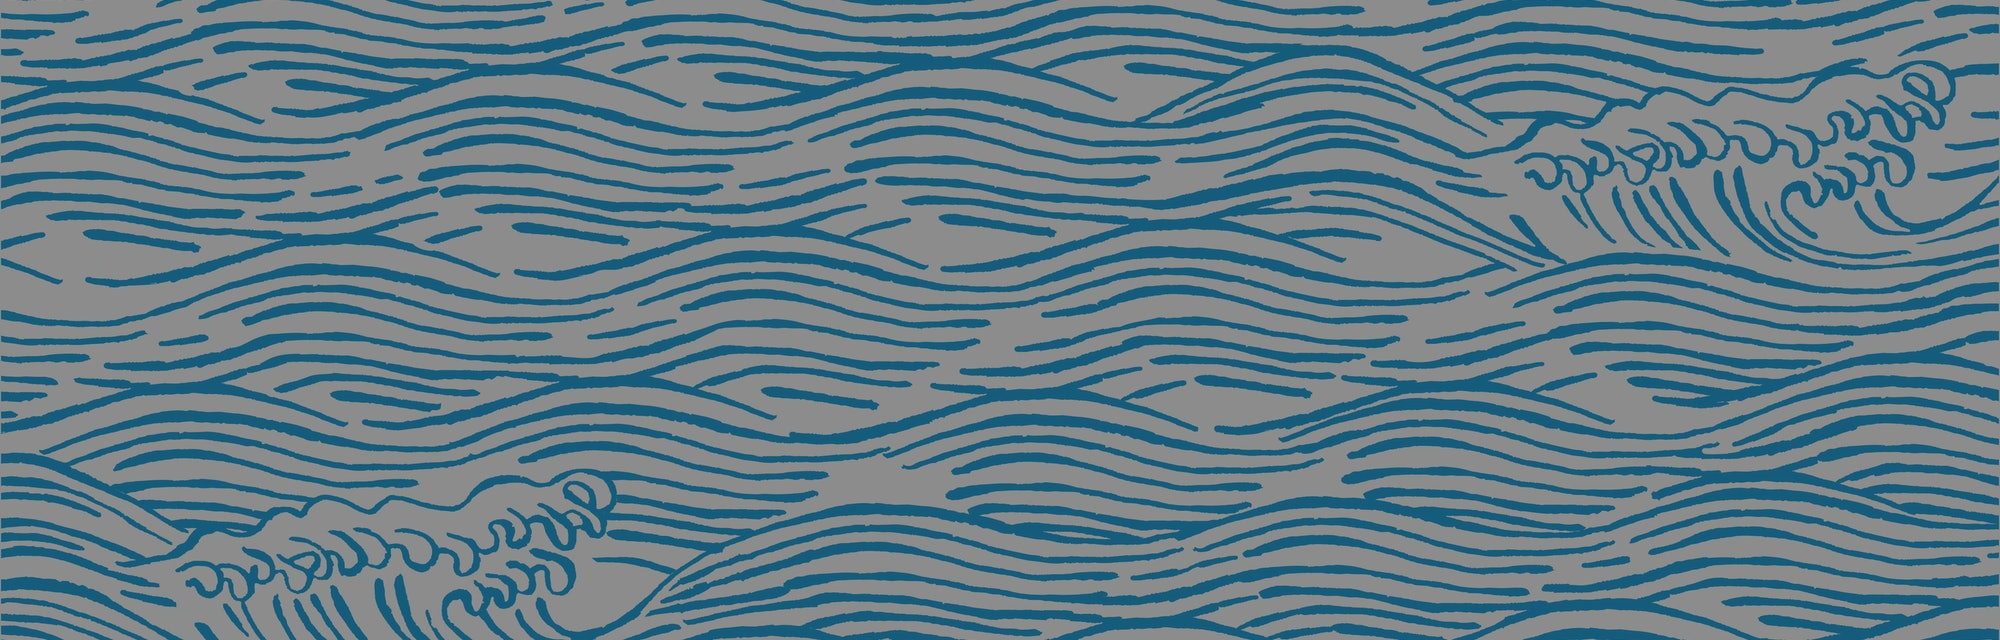 Sea waves japanese style illustration